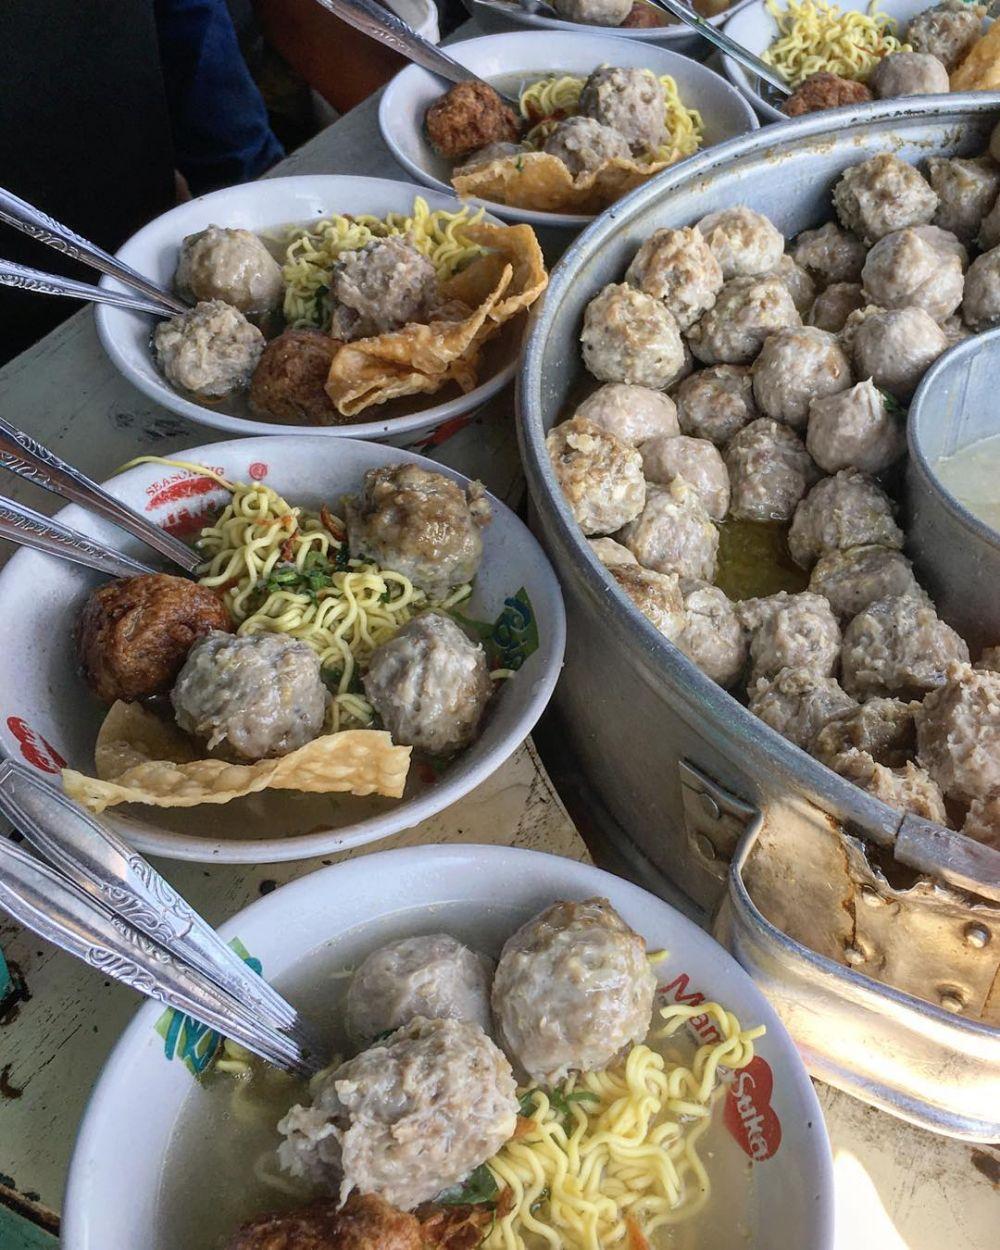 20 Tempat kuliner bakso favorit di Jogja © 2019 brilio.net